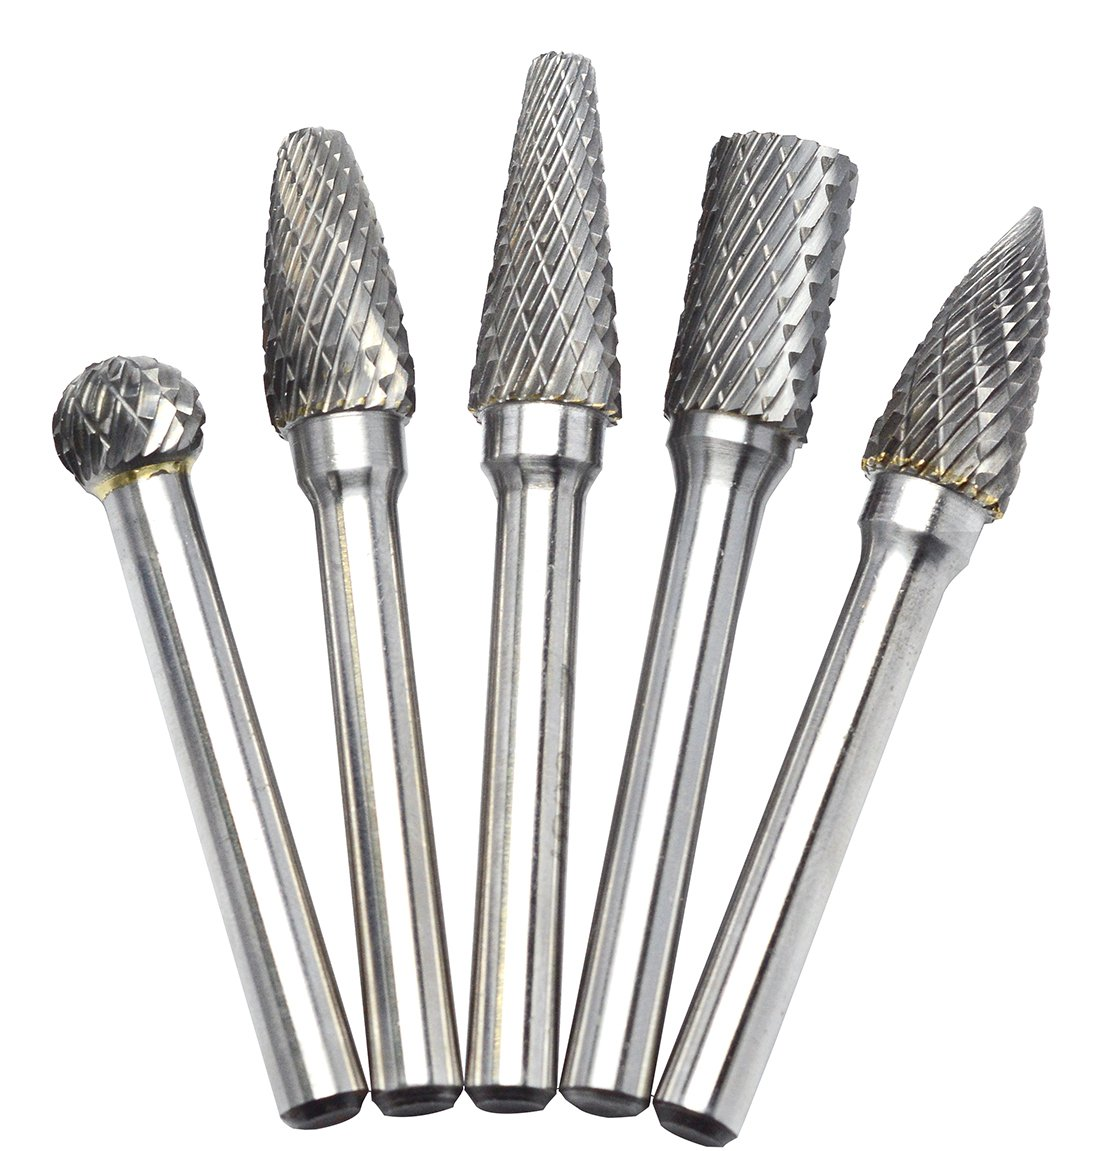 5Pcs Head Tungsten Carbide Rotary Burr Die Grinder Bit Shank Carving Set 6mm